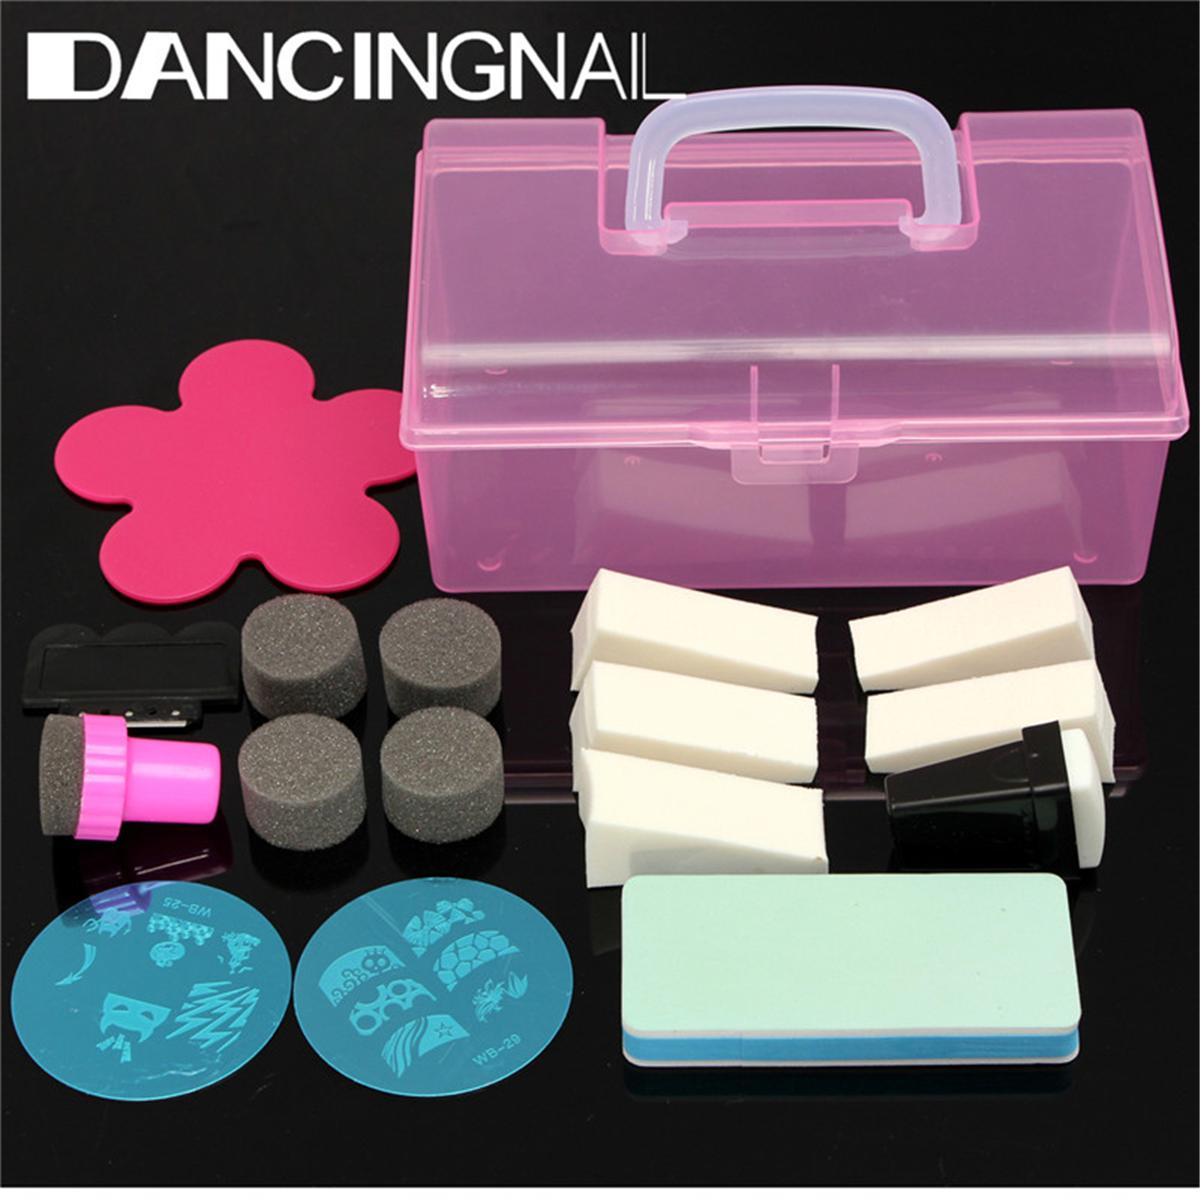 DANCINGNAIL 1 set Nail Art Sponge Stamp Polish DIY Deco Design Kit